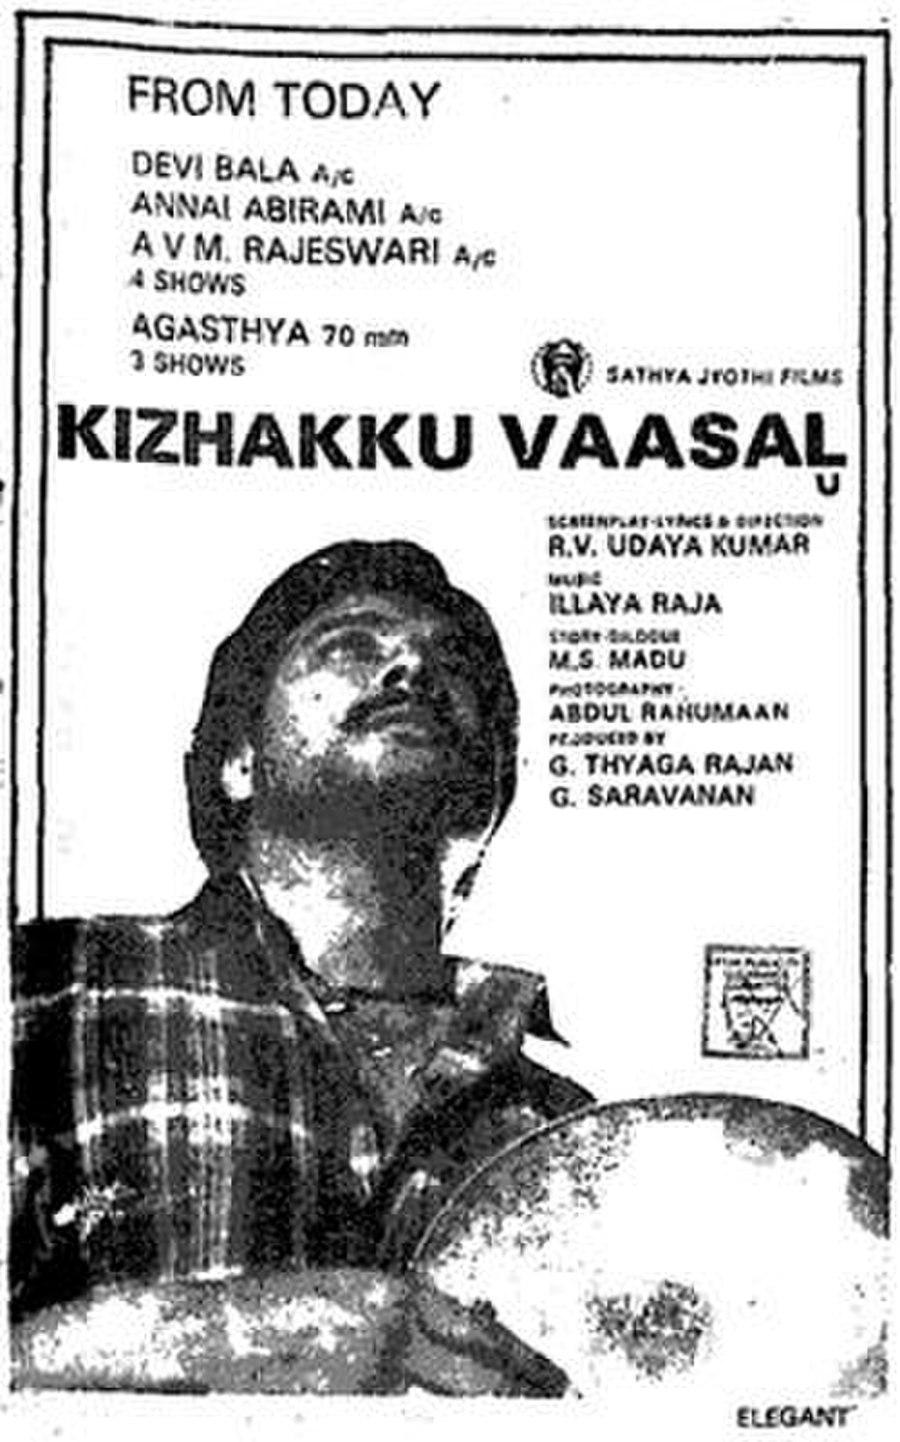 Kizhakku Vaasal